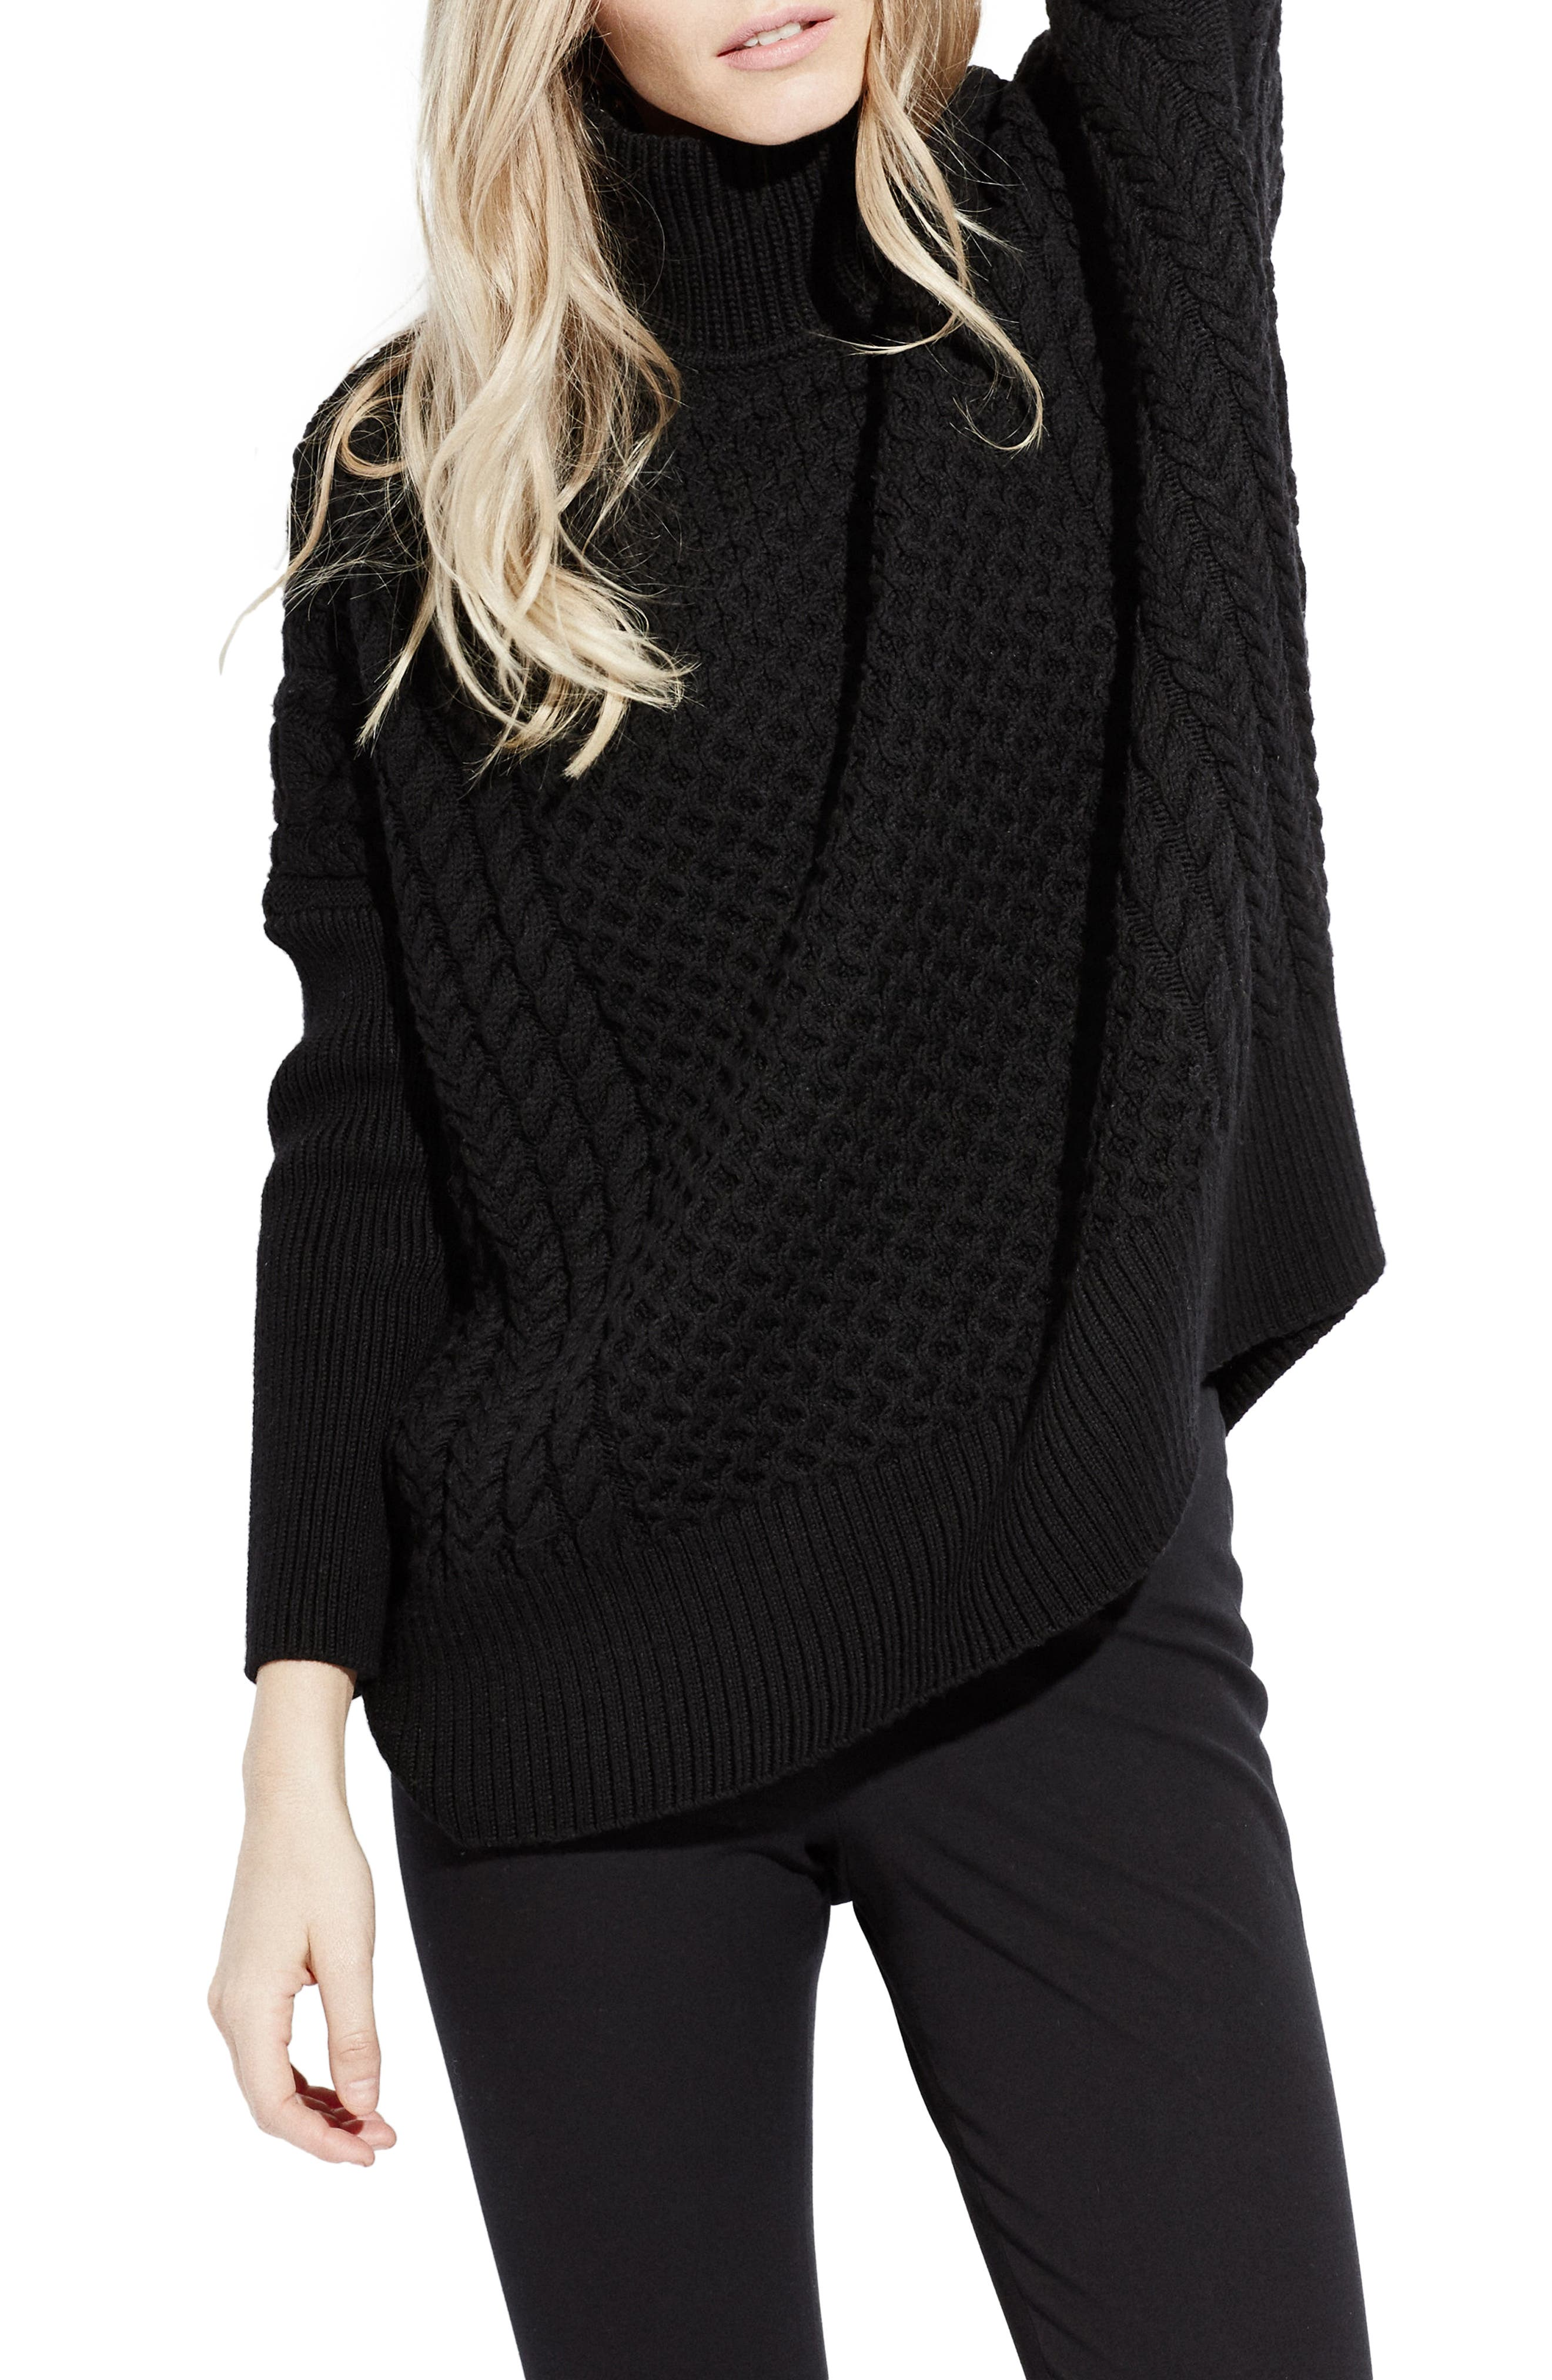 Le Square Turtleneck Sweater,                             Main thumbnail 1, color,                             001